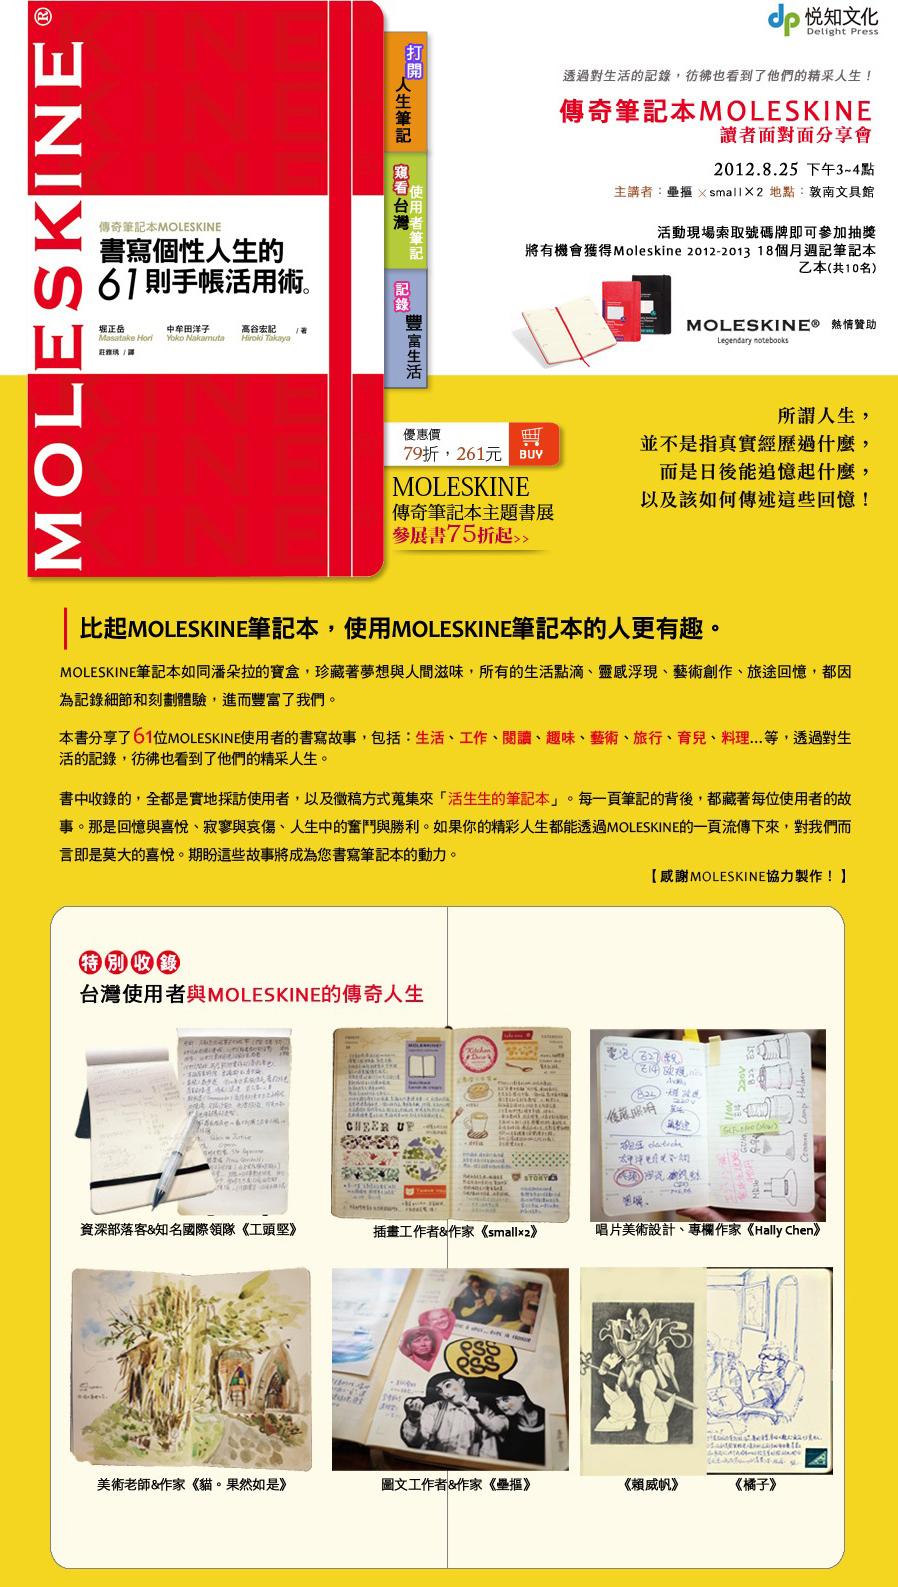 《傳奇筆記本MOLESKINE》讀者面對面分享會 – Yu-hsuan Huang Illustration